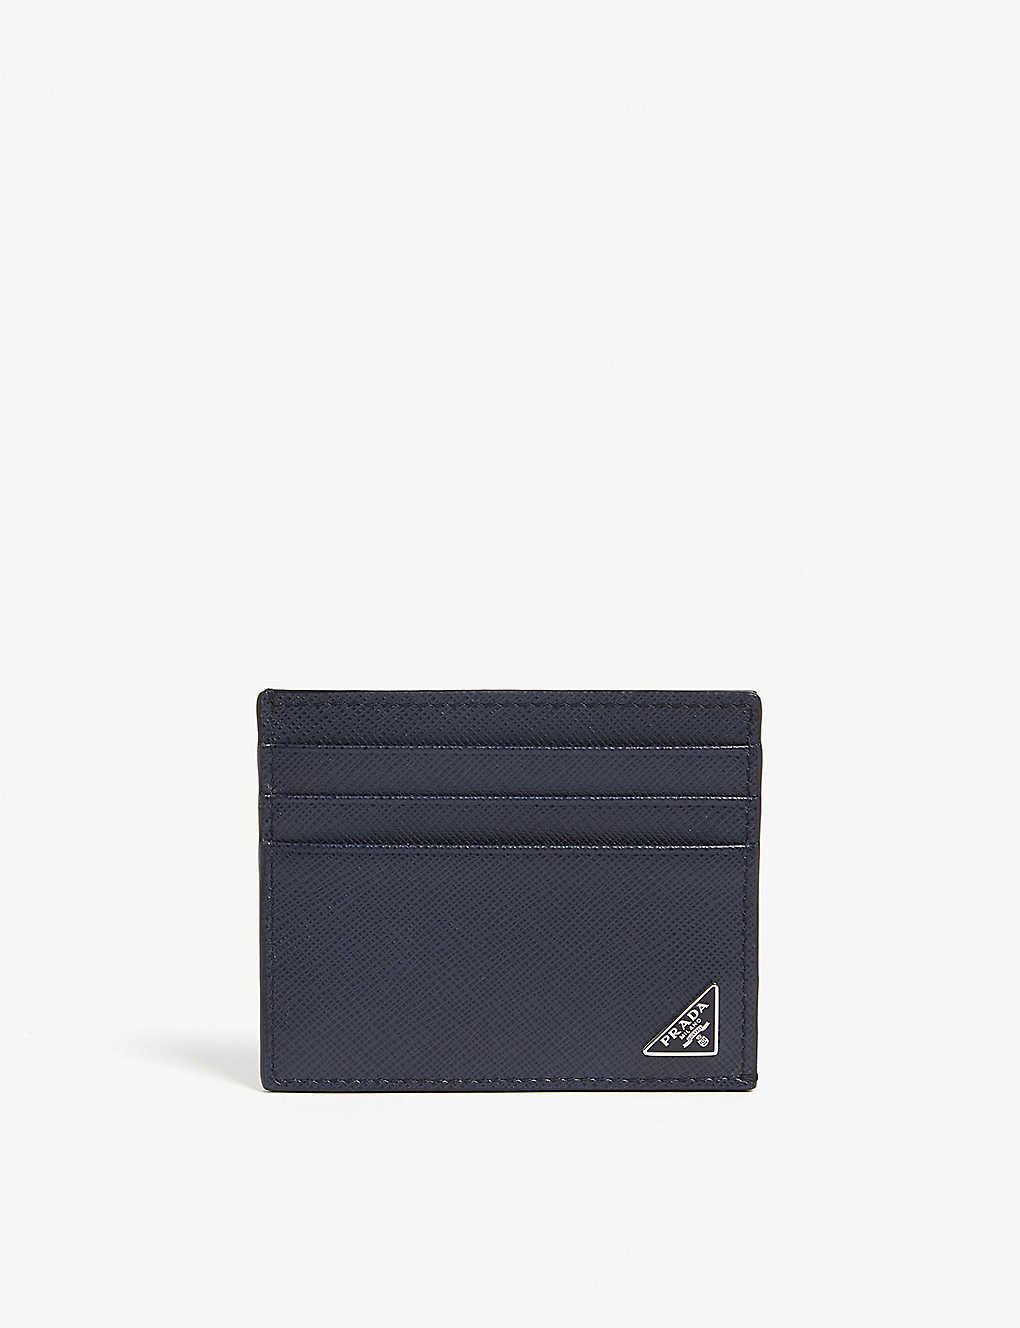 62447372624b PRADA - Saffiano leather card holder | Selfridges.comm